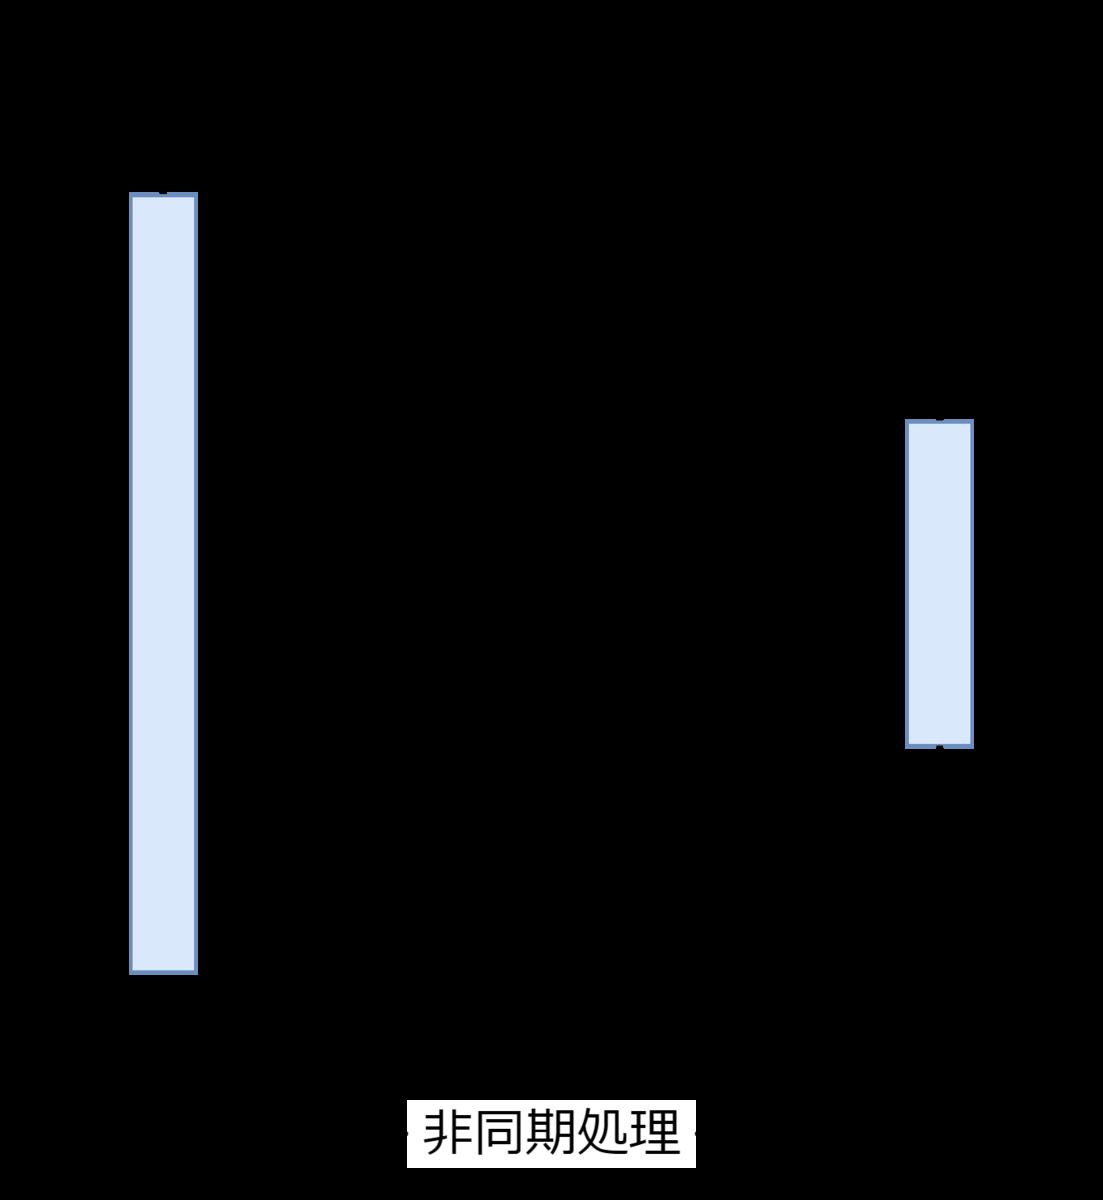 f:id:utouto97:20210708220050p:plain